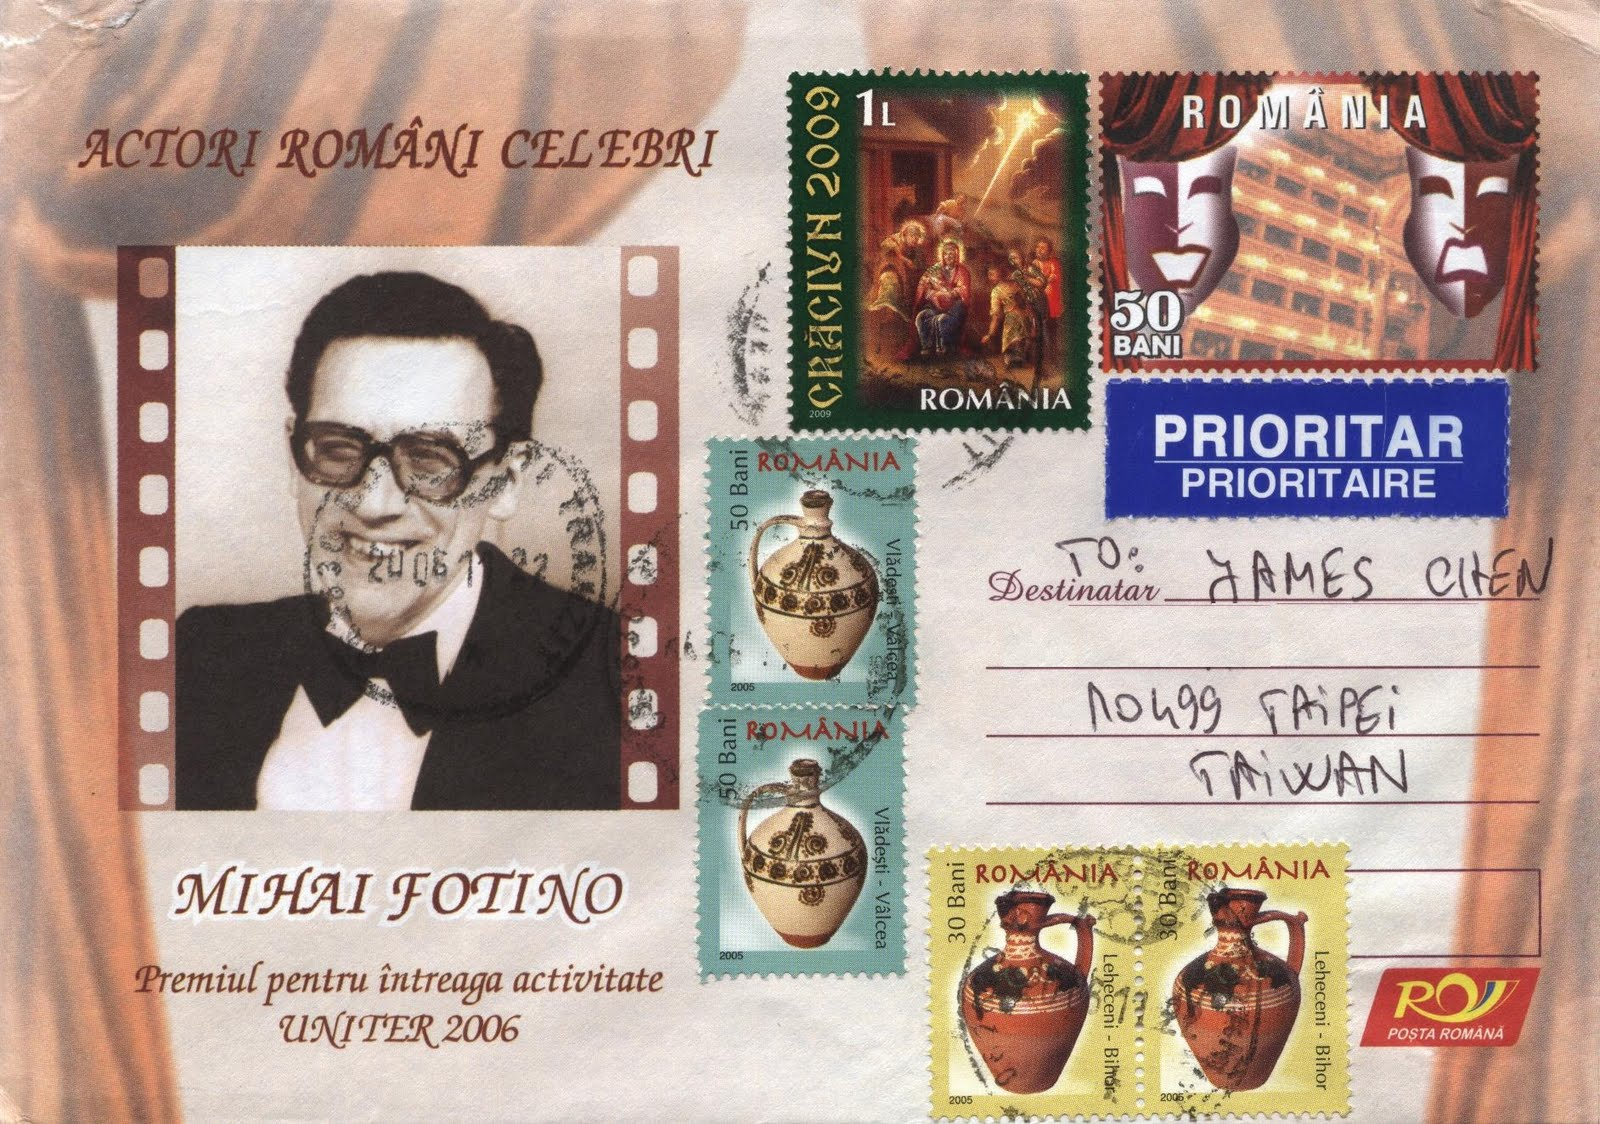 Mihai Fotino